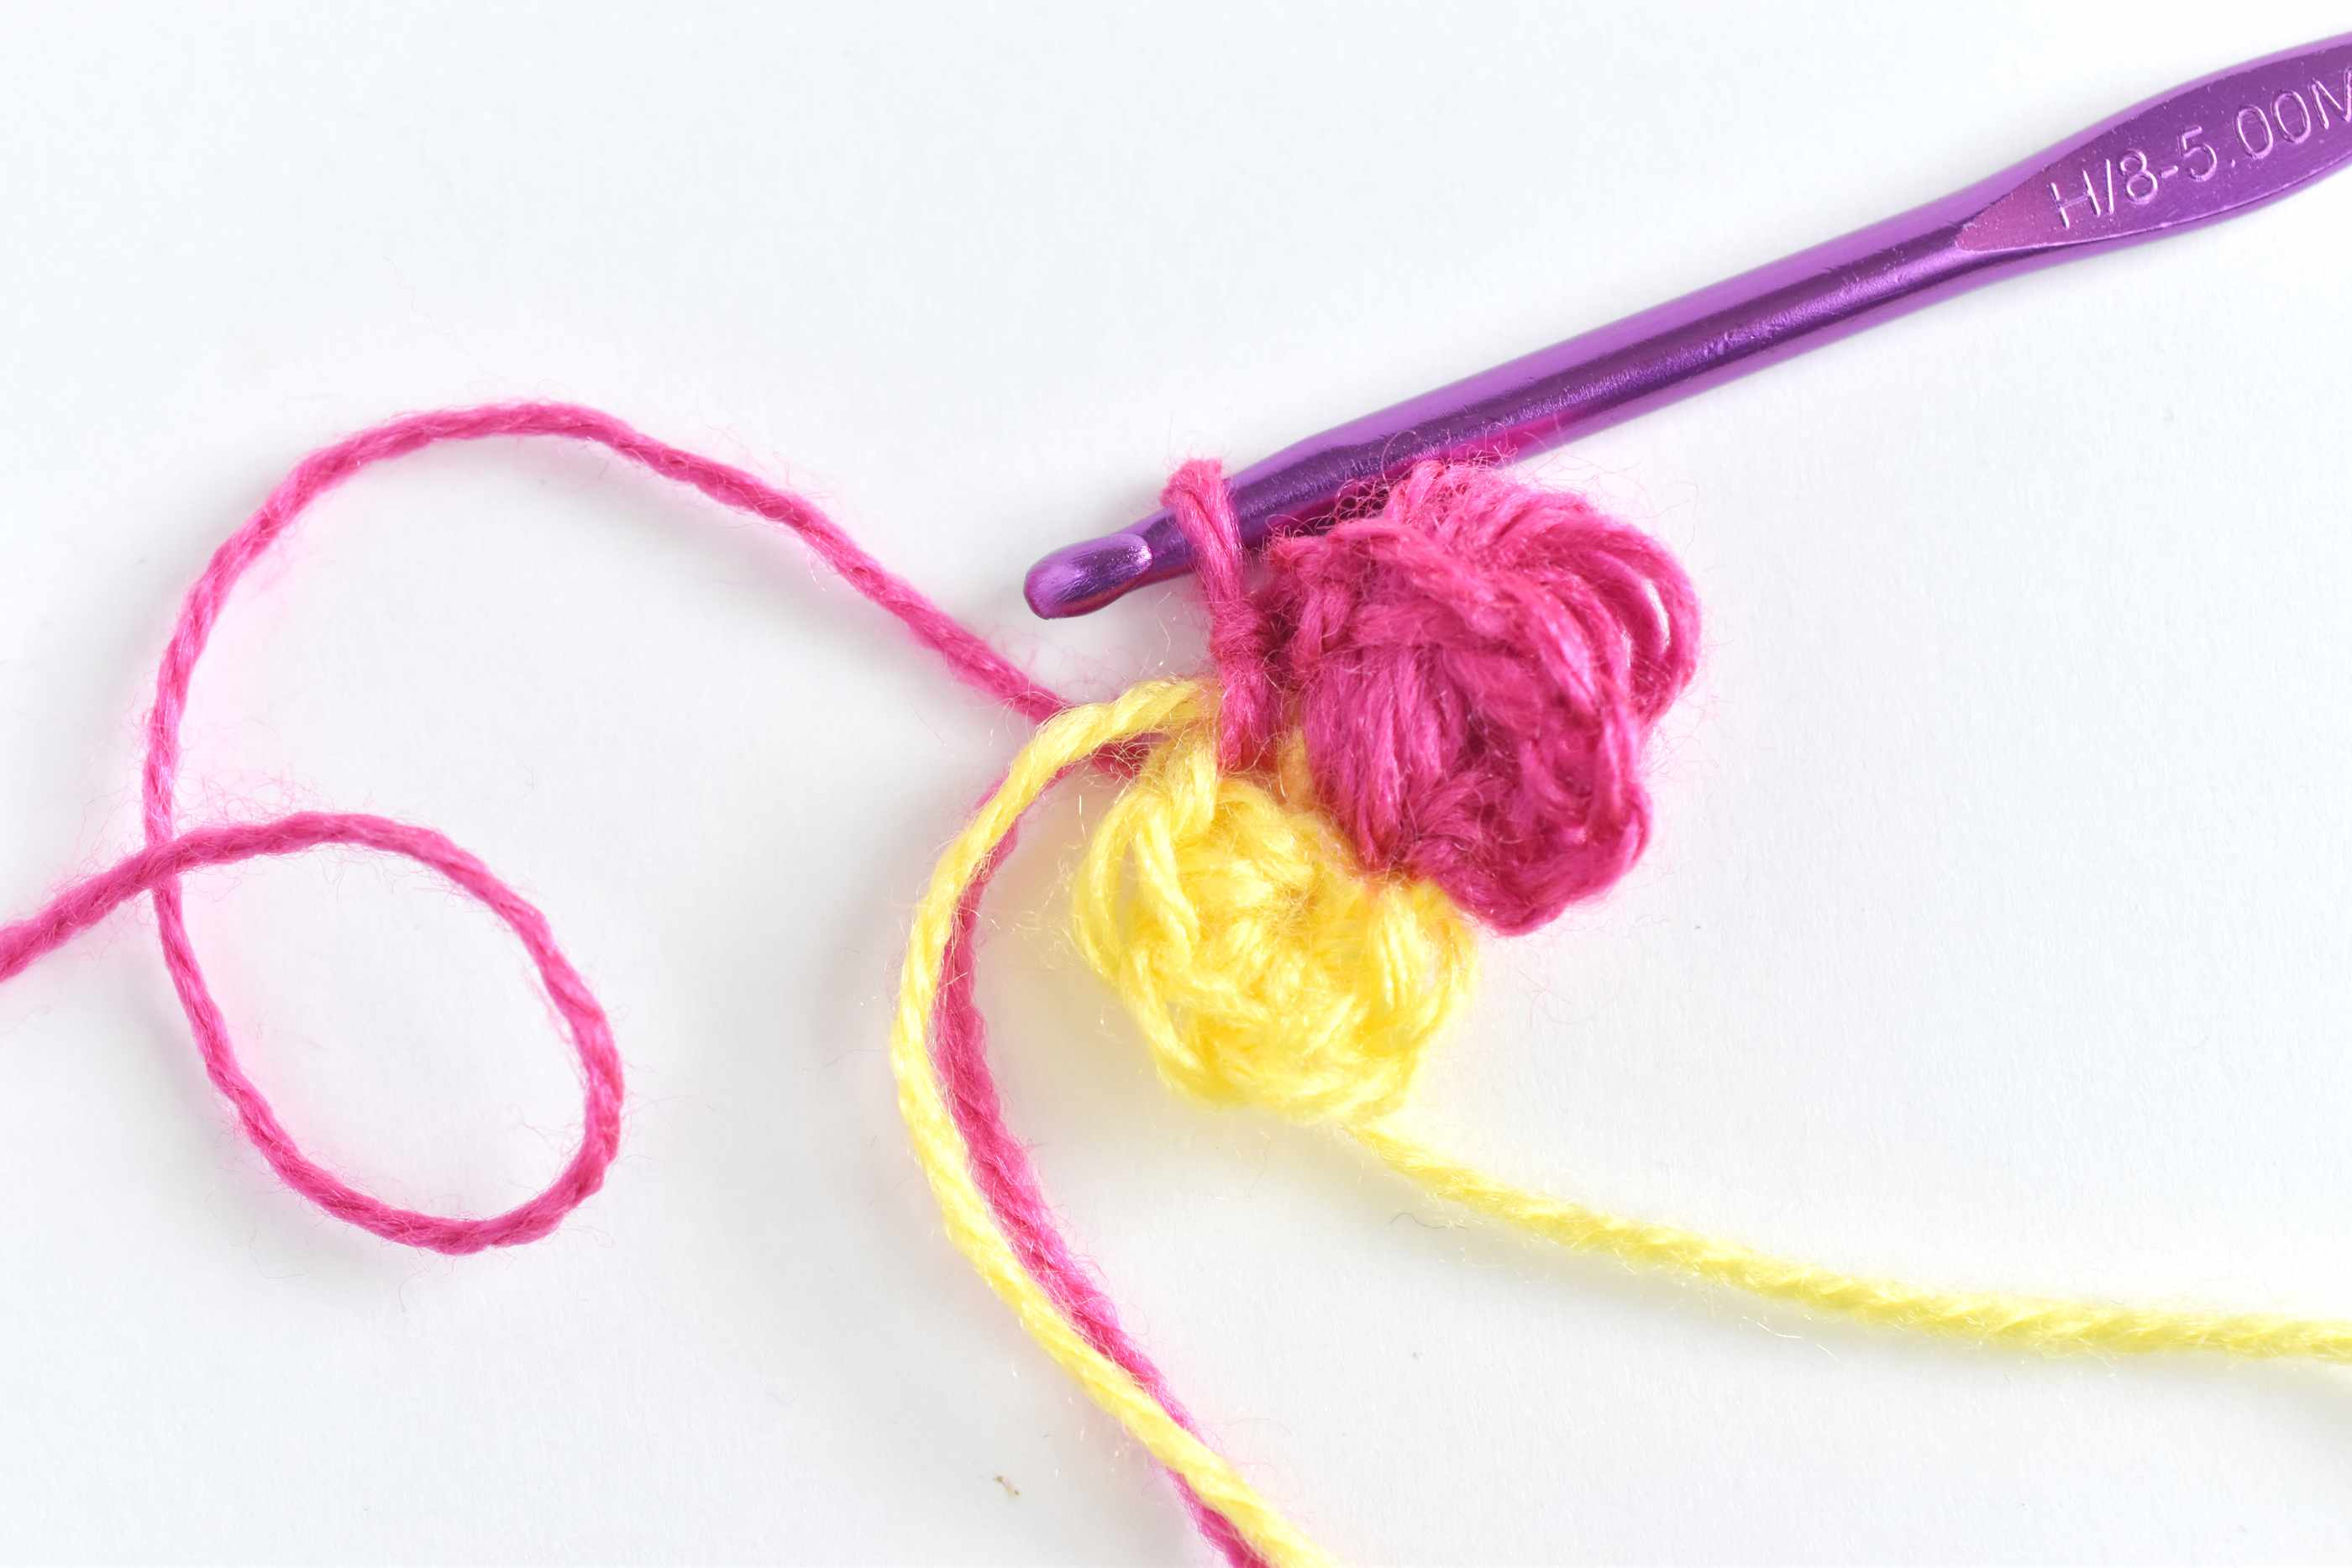 Slip Stitch in the Next Single Crochet